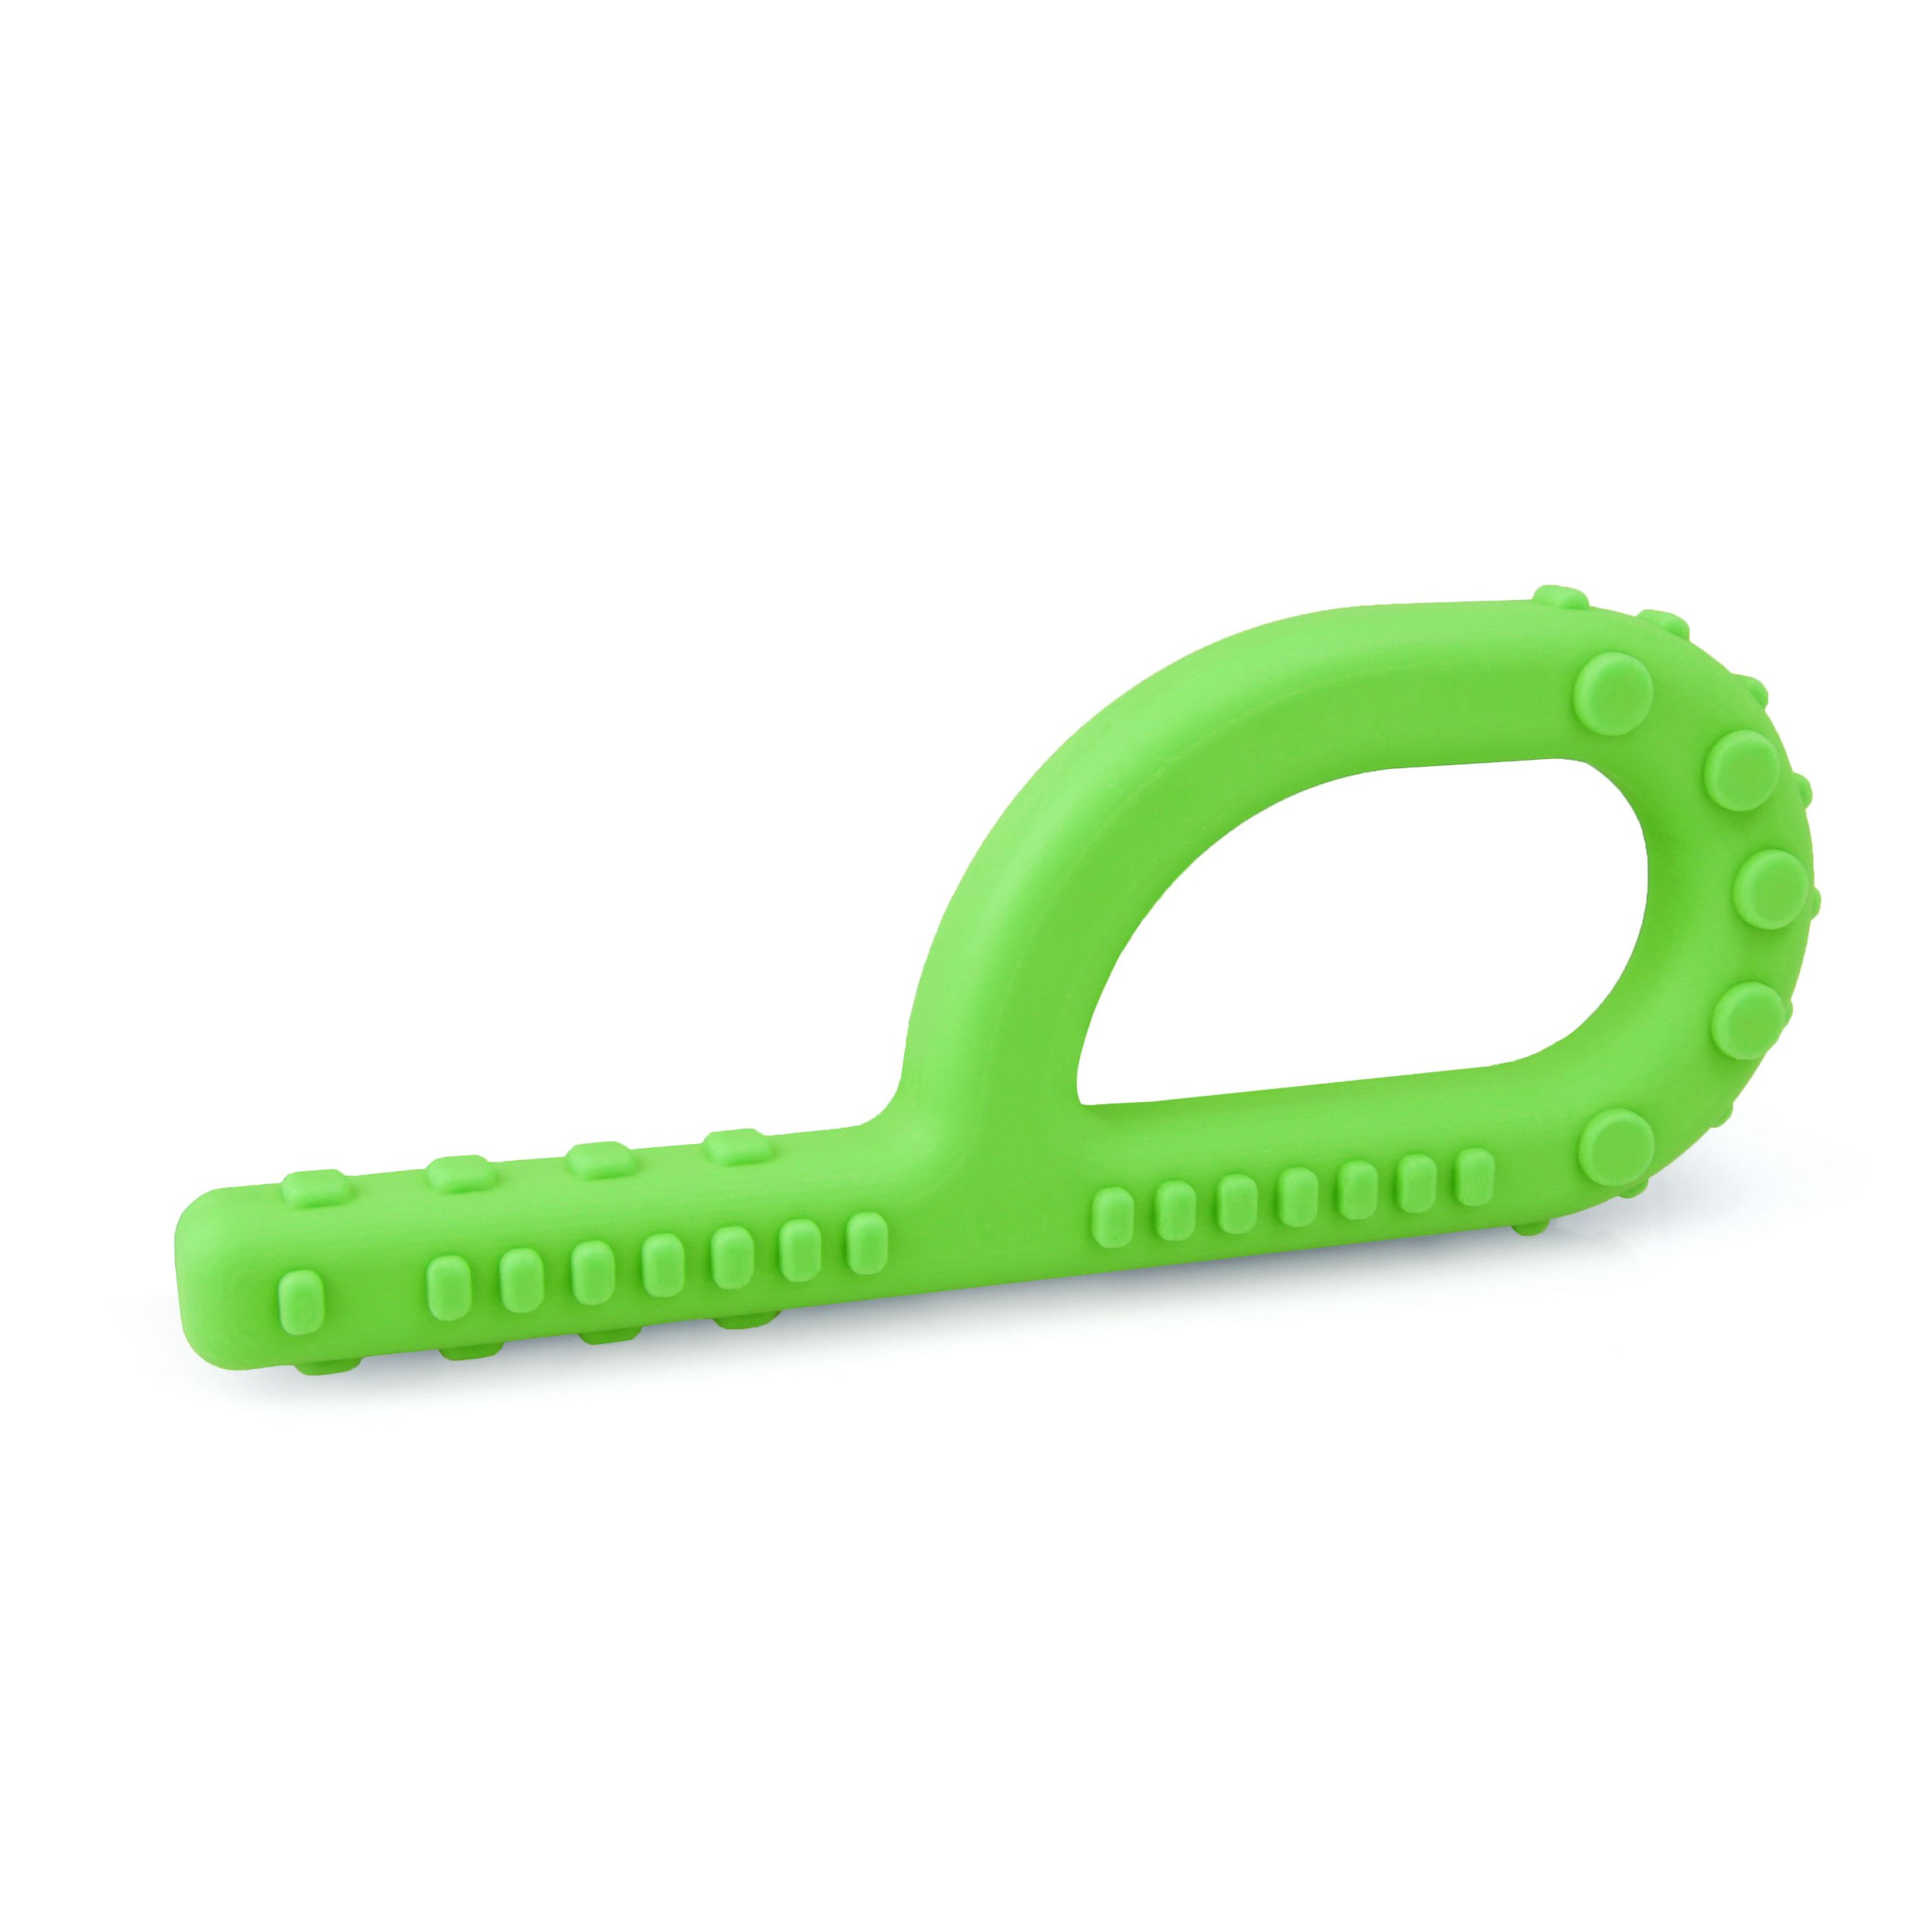 ARK's Textured Grabber XT - Extra Tough Sensory Oral Motor Chew Tool